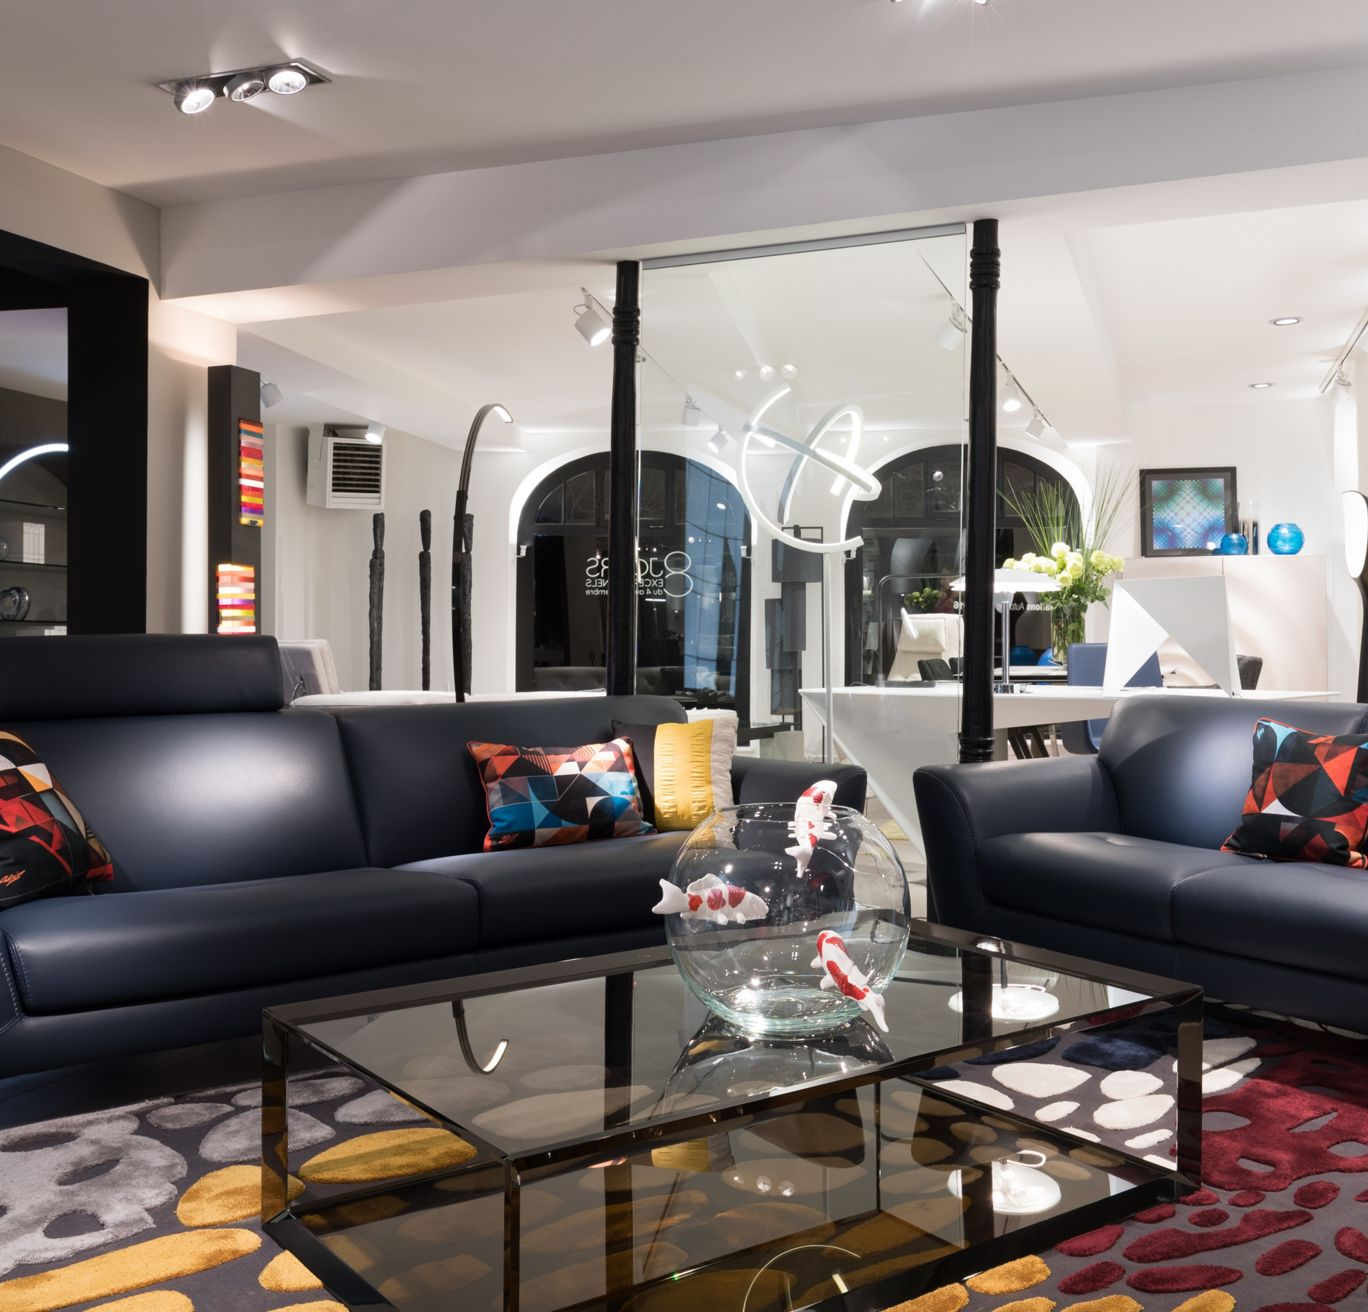 roche bobois showroom colmar 68000. Black Bedroom Furniture Sets. Home Design Ideas